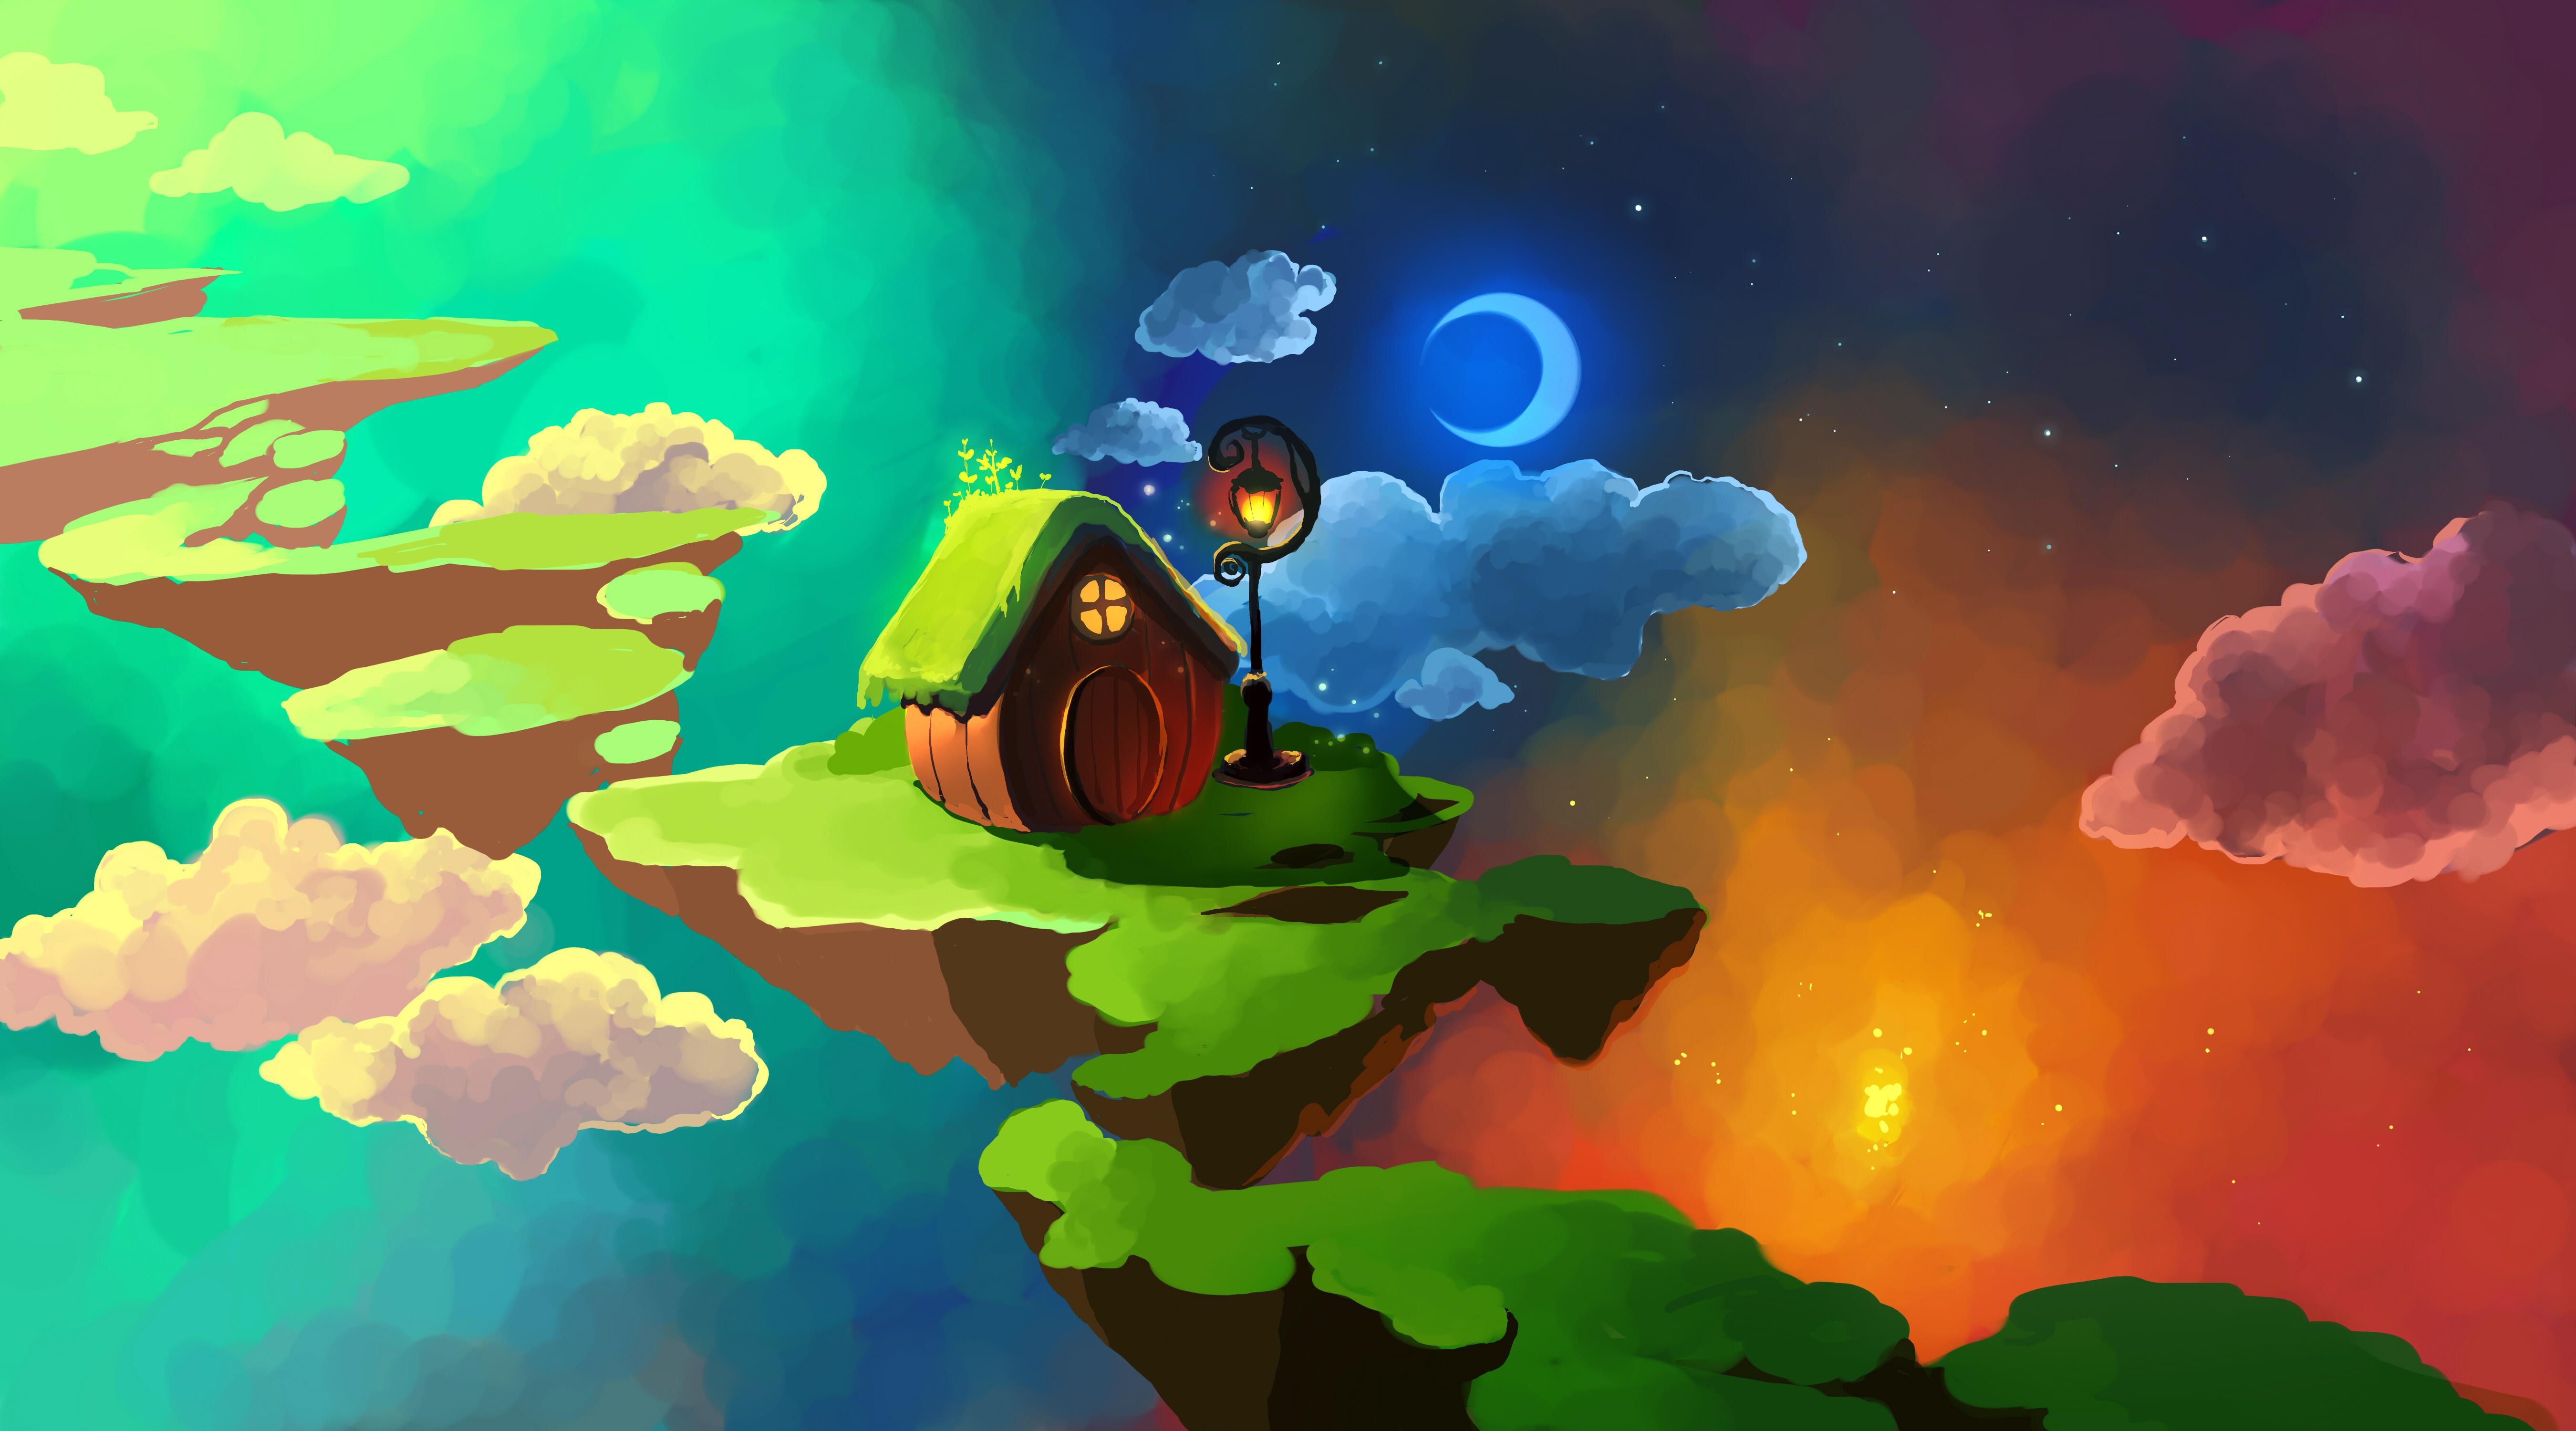 General 5400x3000 Chibionpu floating island space Moon stars clouds cottage artwork lantern street light